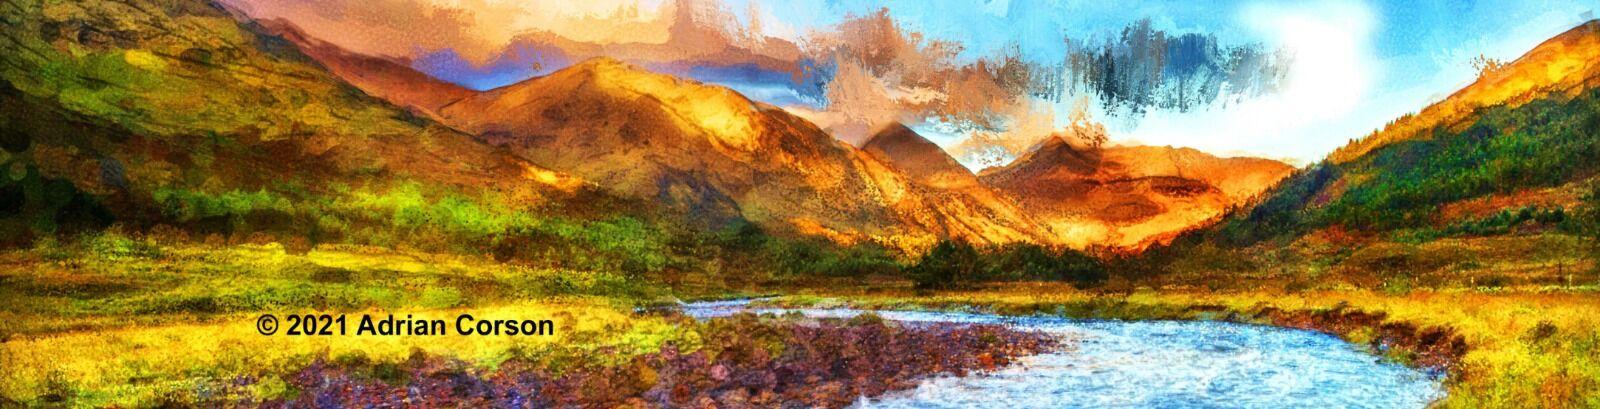 109-mountain valley